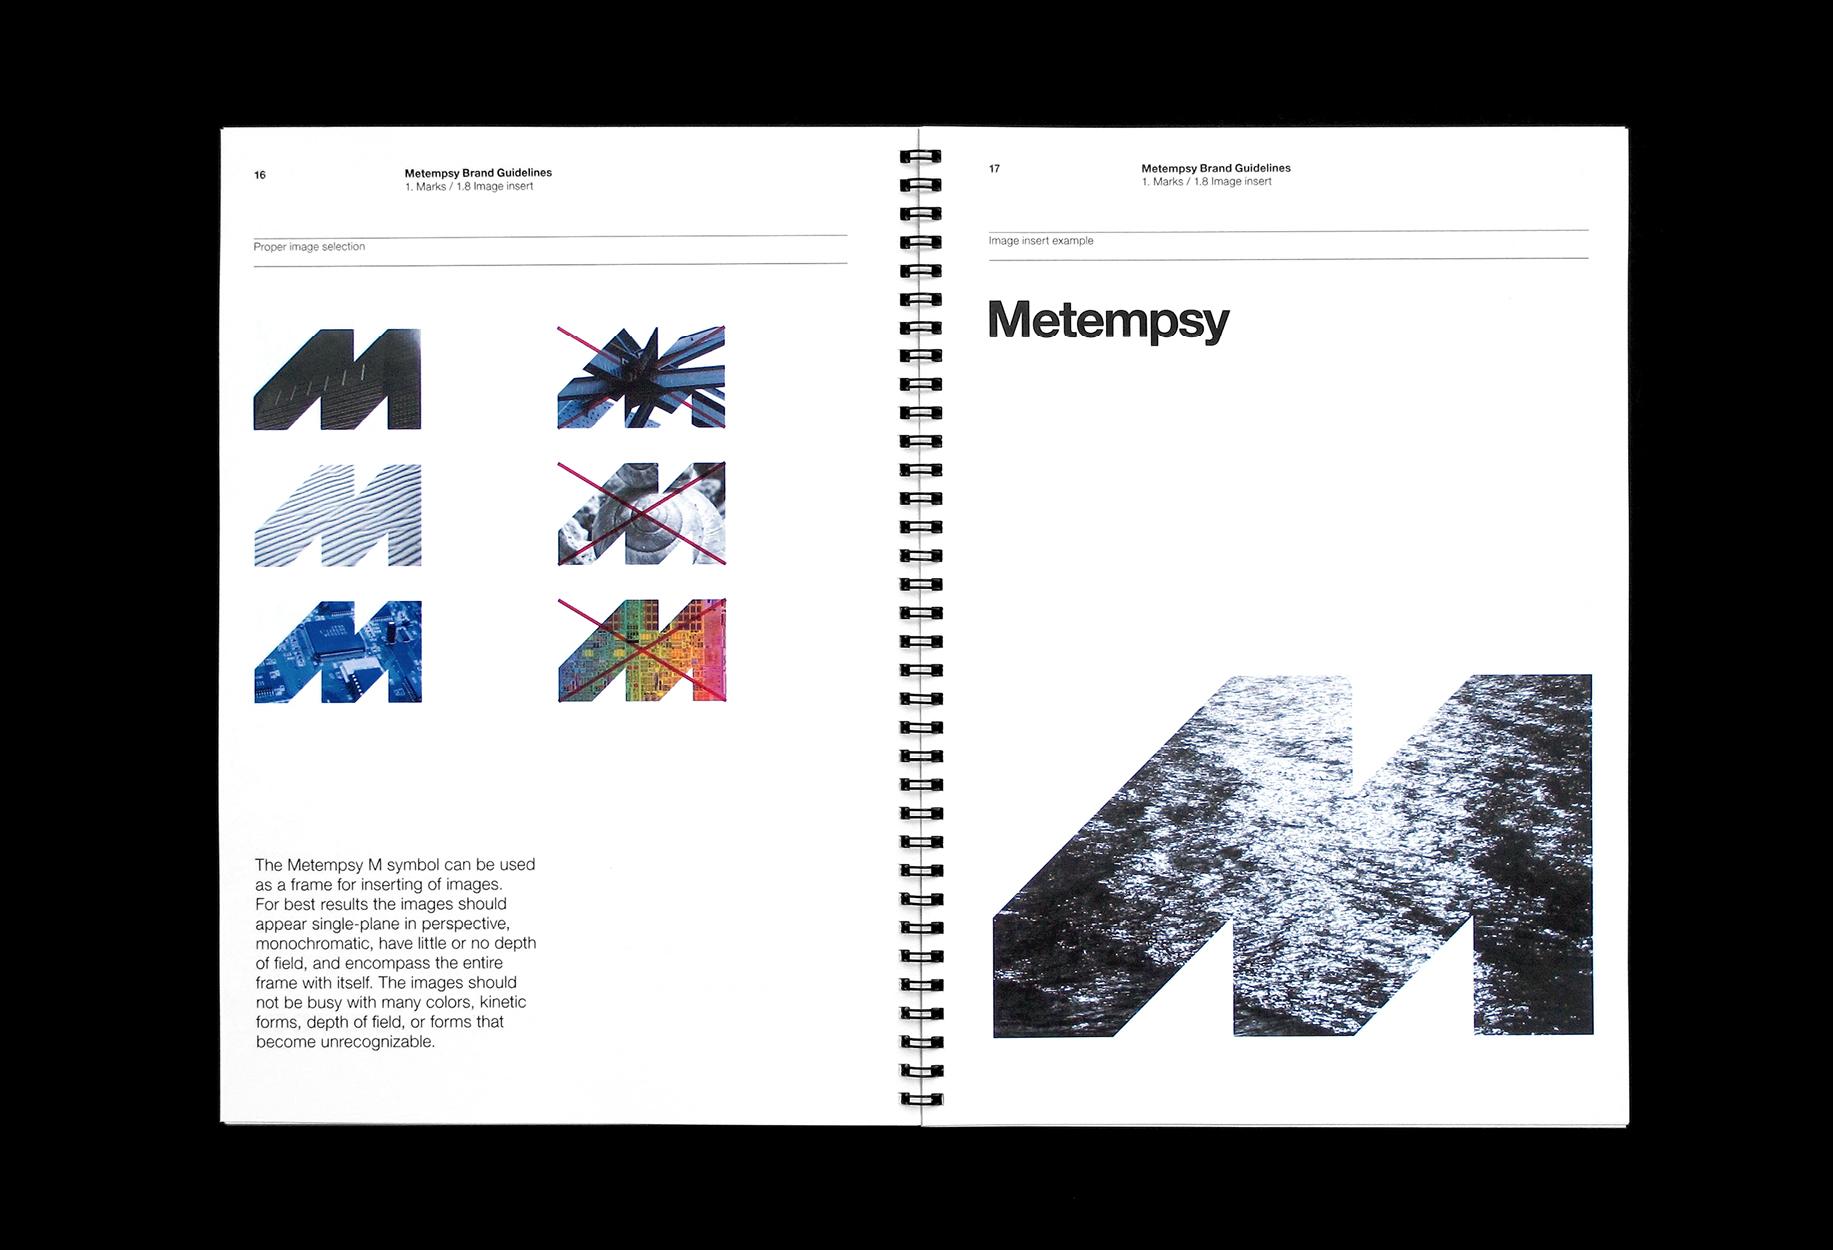 Metempsy-Graphic-Design-Standards-Manual-9.jpg